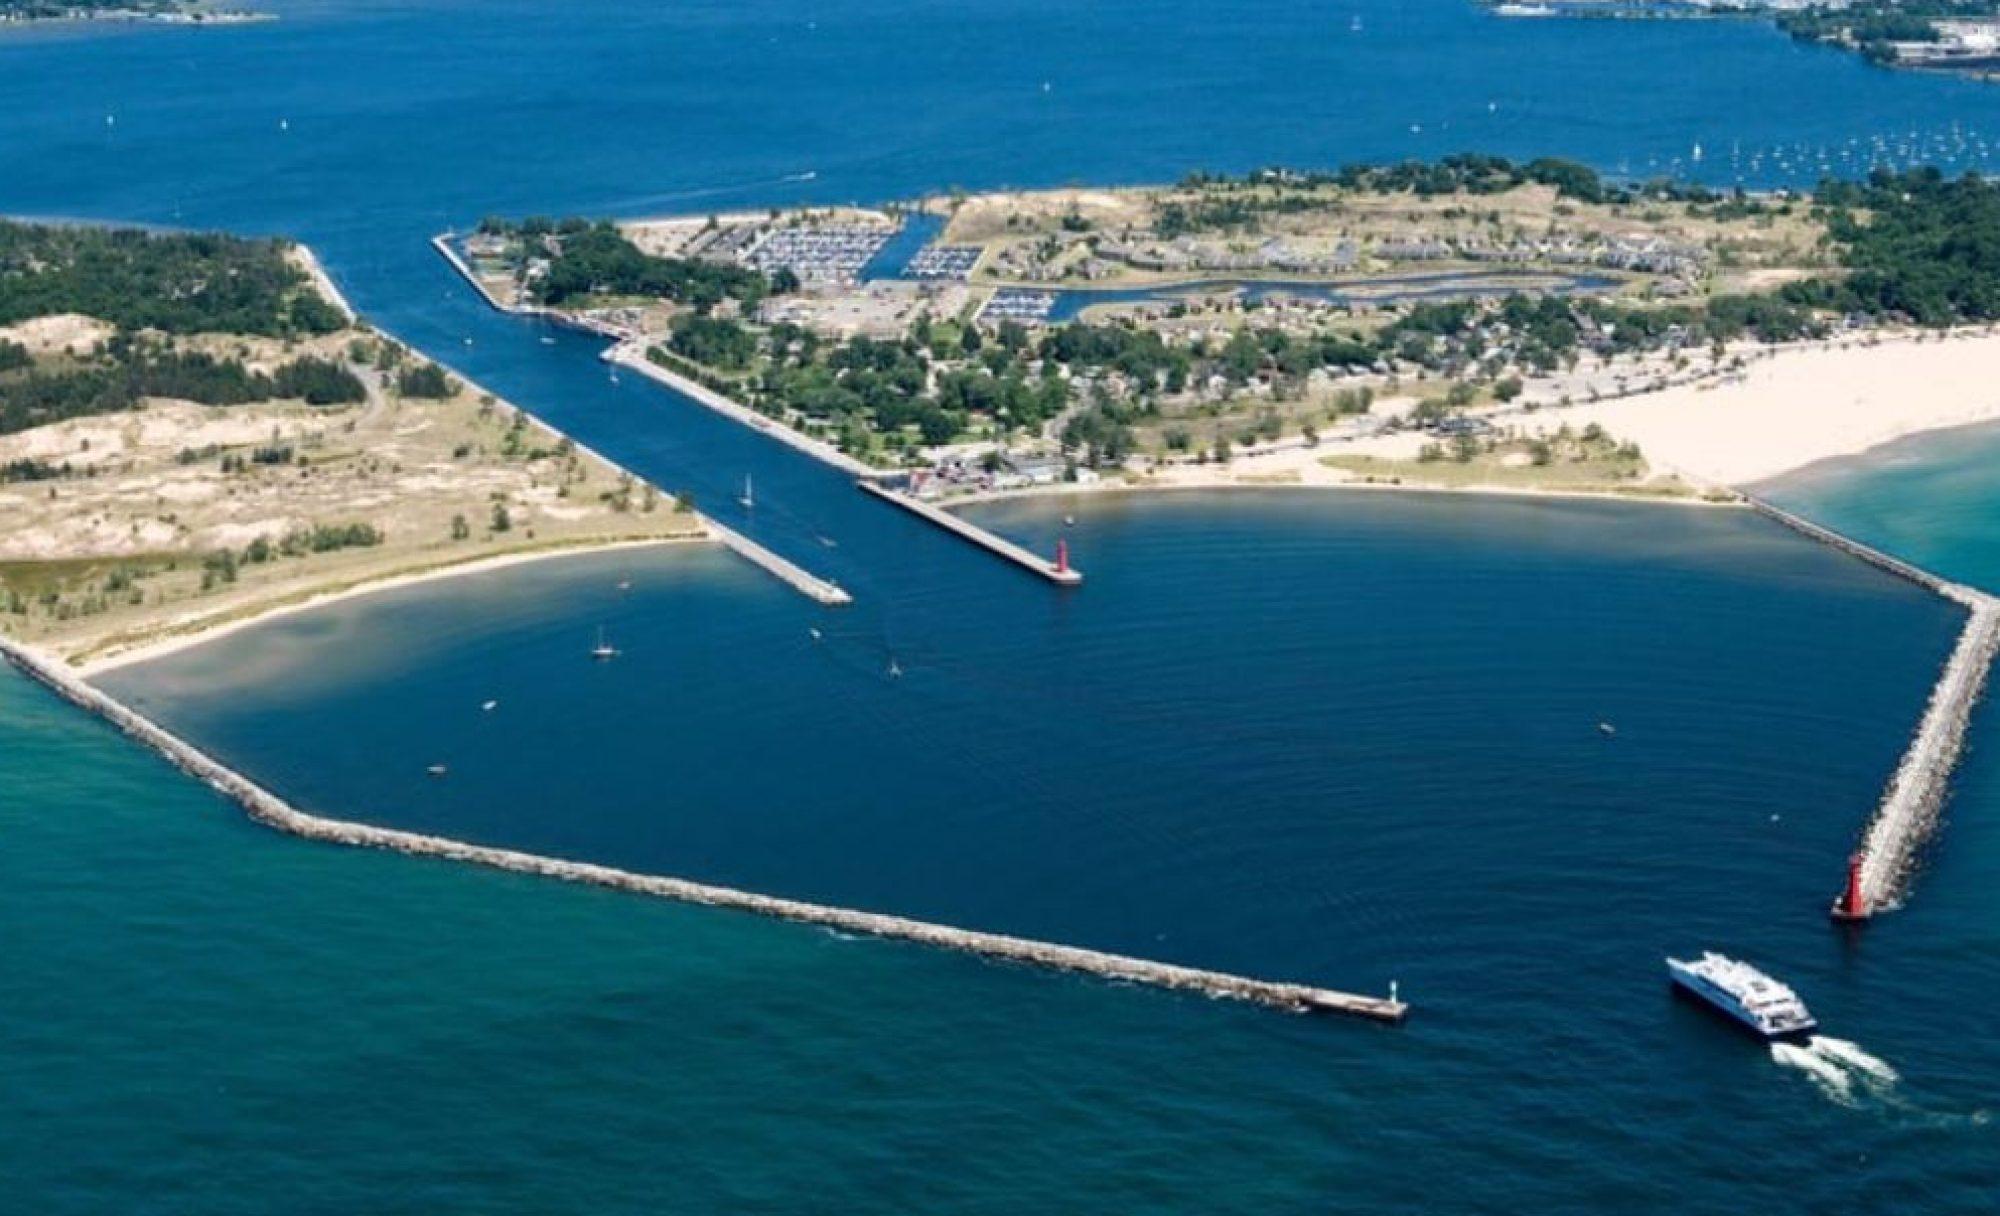 West Michigan Aerial Imaging